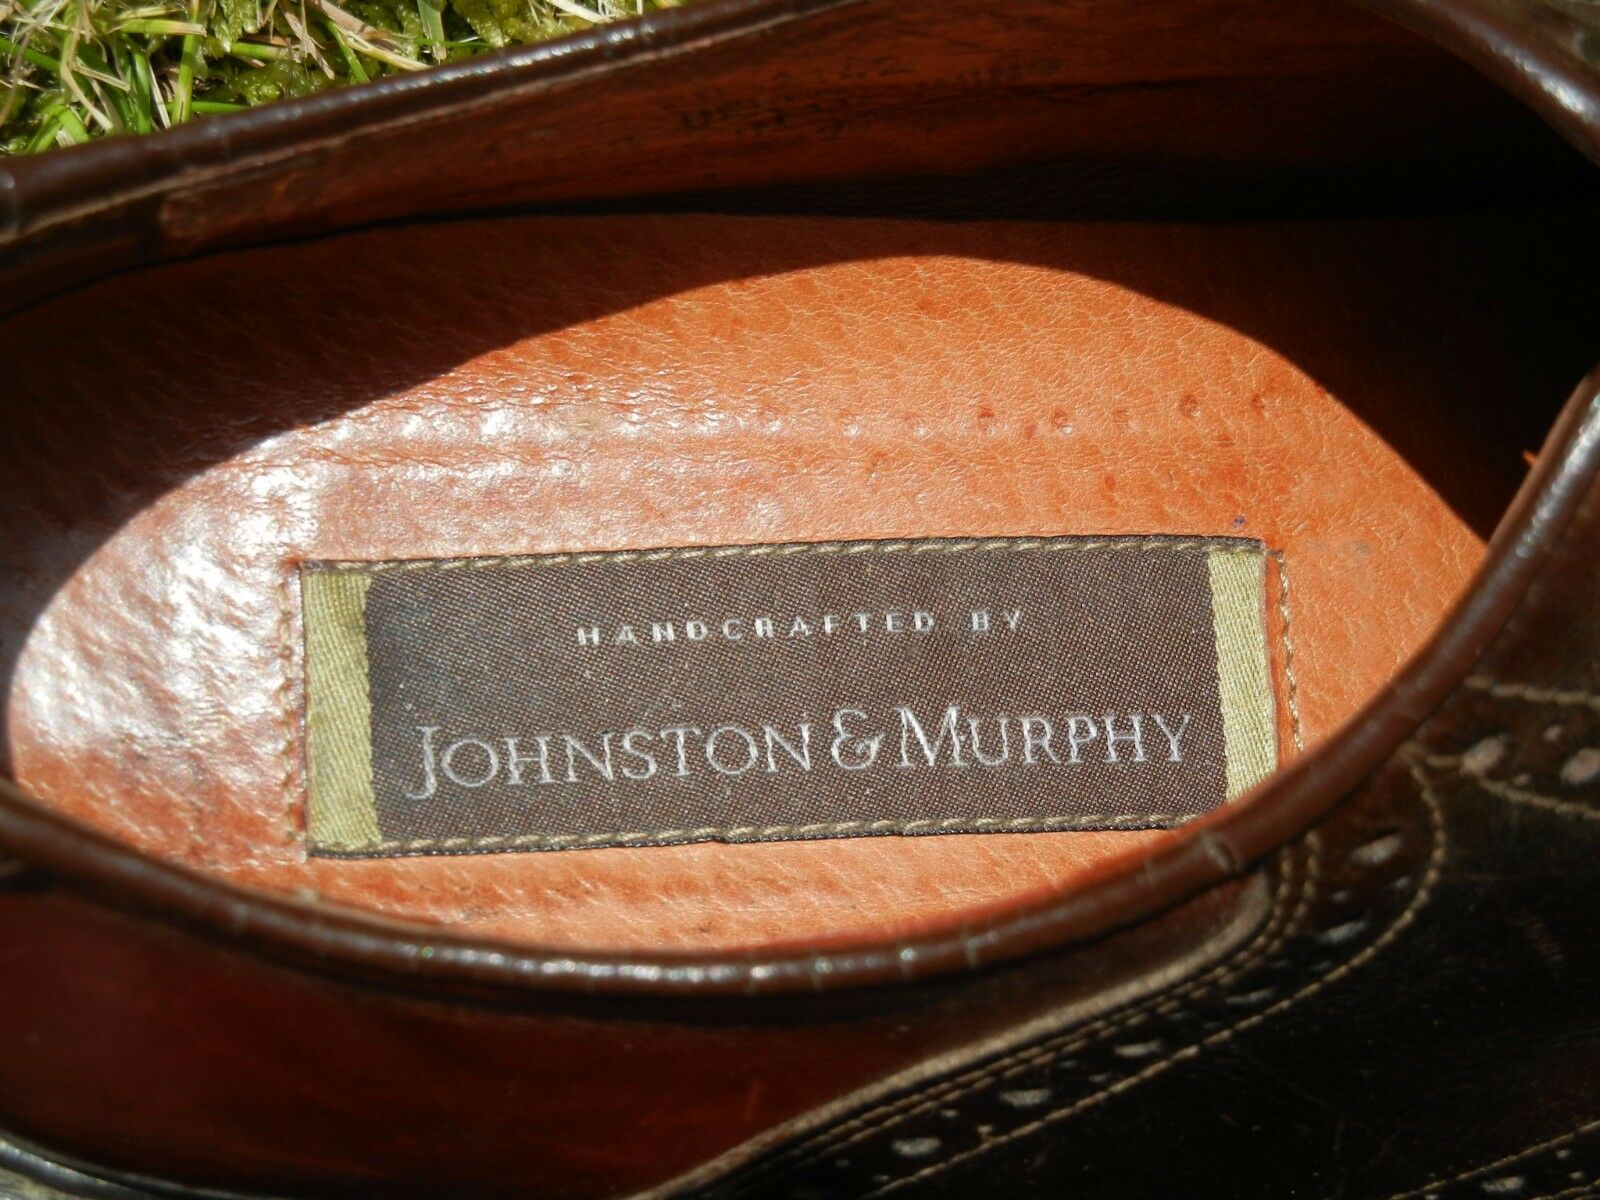 JOHNSTON & MURPHY schuhe schuhe schuhe 9M USA LACE-UP ITALIAN 2 TONE braun ORIGINAL SOLES EU44 0d8c20